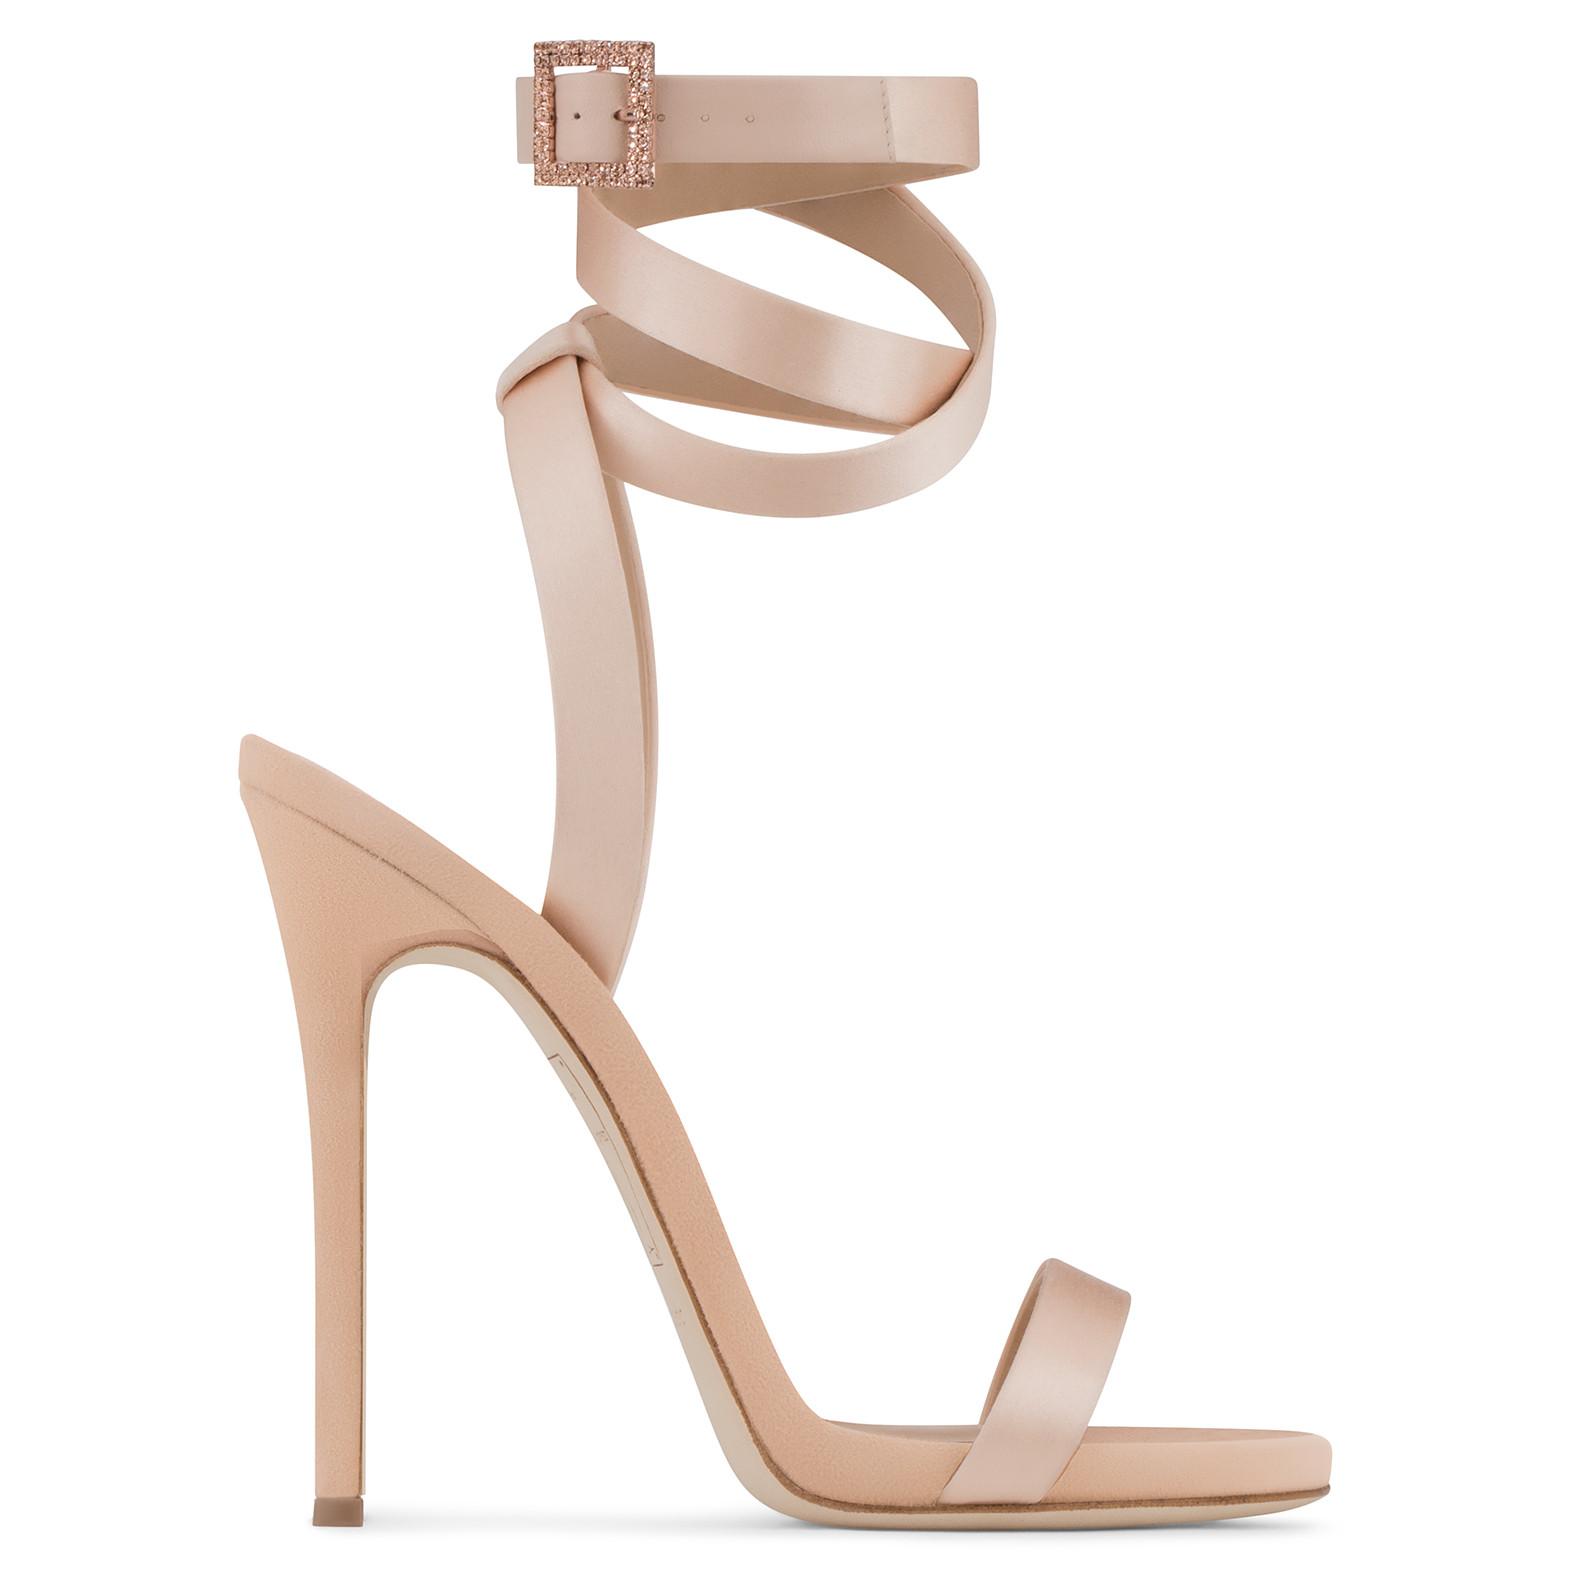 Giuseppe Zanotti - Giuseppe For Jennifer Lopez: Pale Pink Satin Sandal Leslie